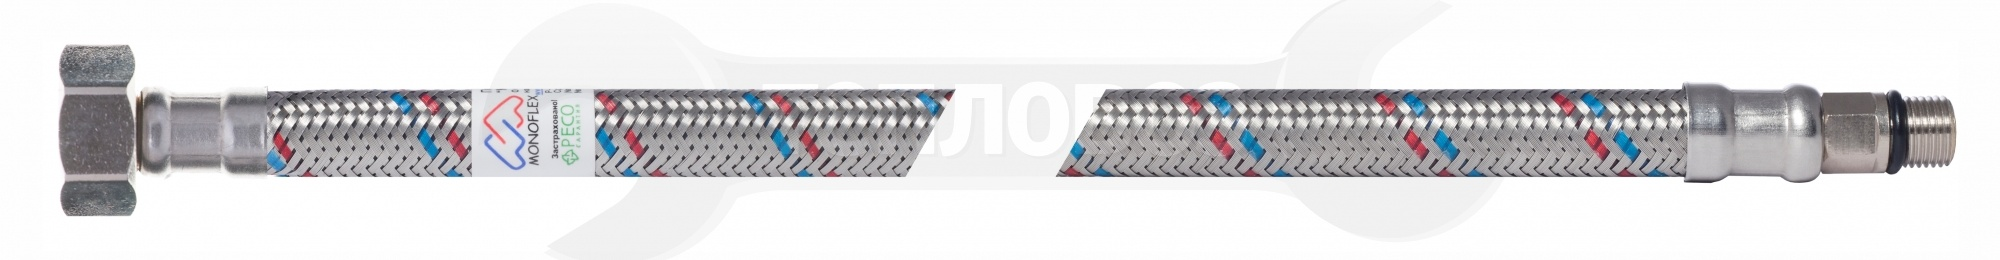 Monoflex 100 см, короткий штуцер